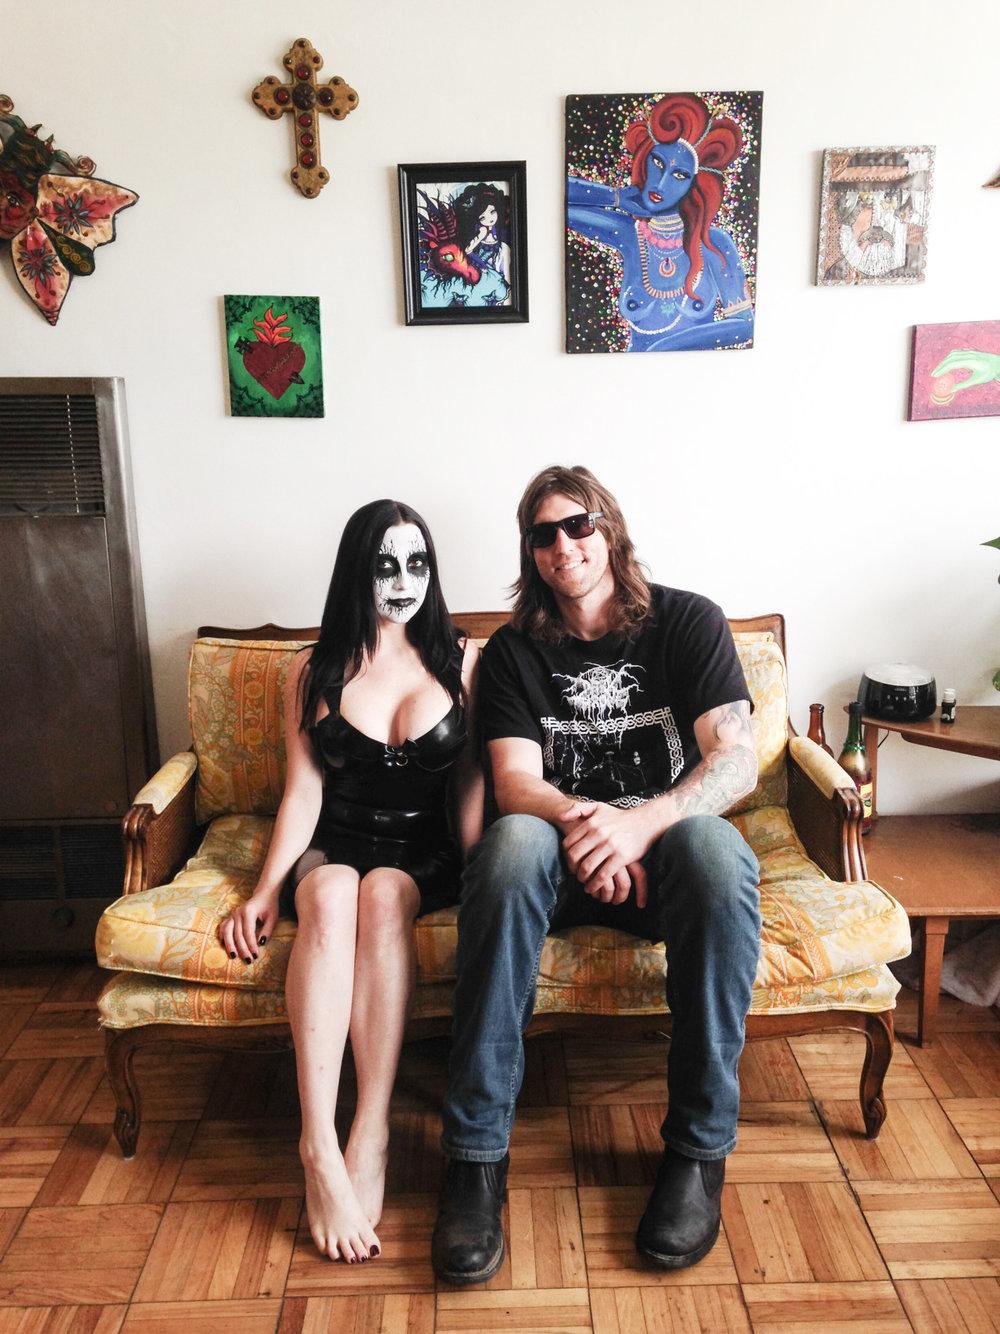 bryanbarnesart :     Art Director / Fashion Photographer Bryan Barnes with model Amanda.  Shot in Los Angeles, April 2014.